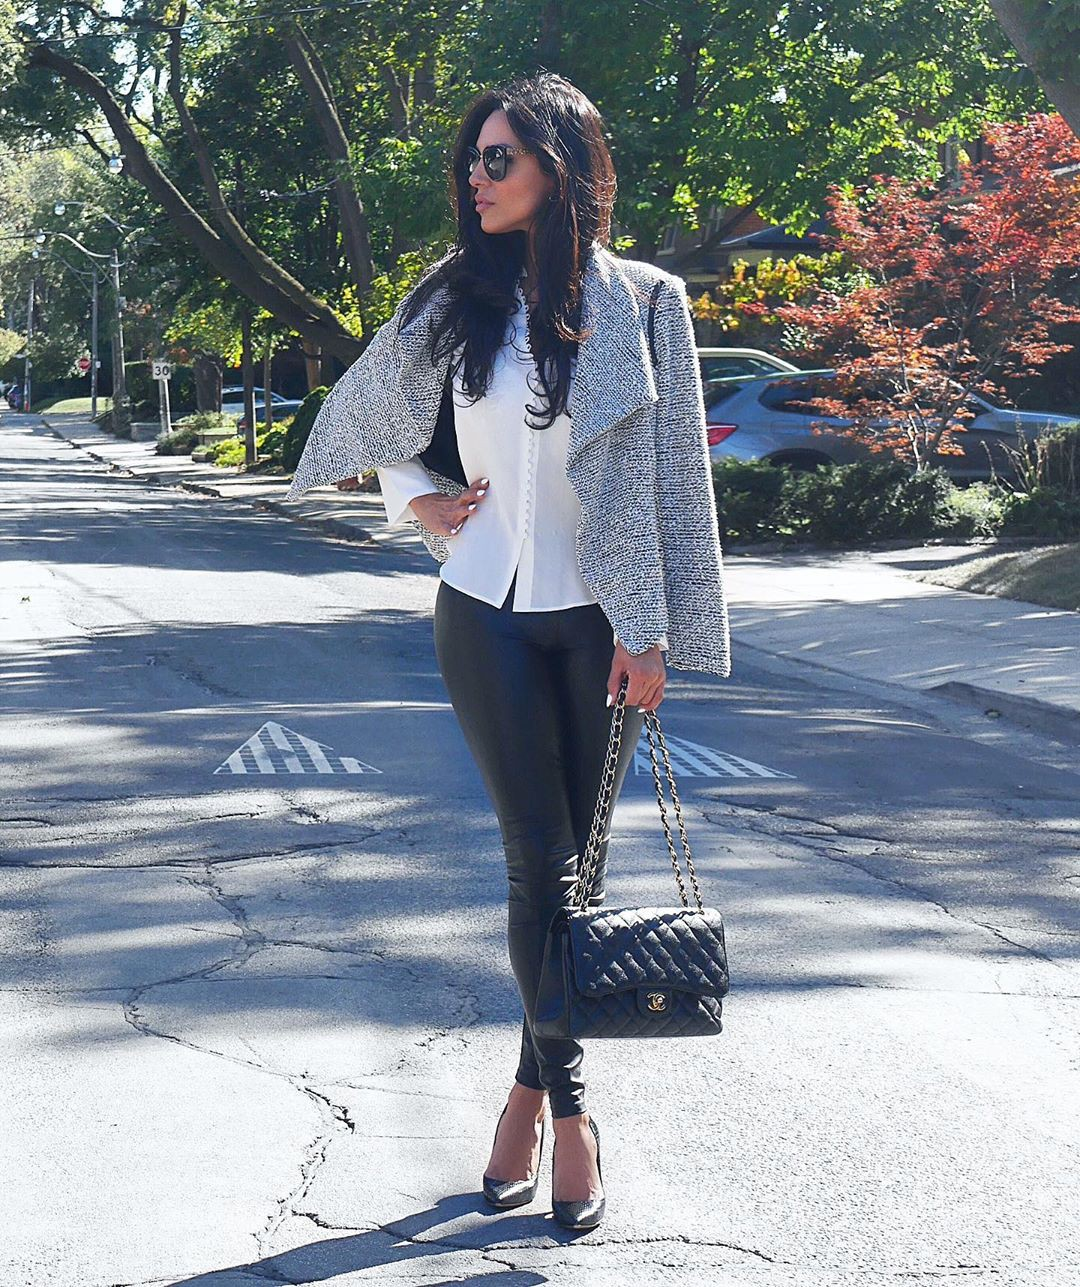 white trendy clothing ideas with jacket, blazer, denim